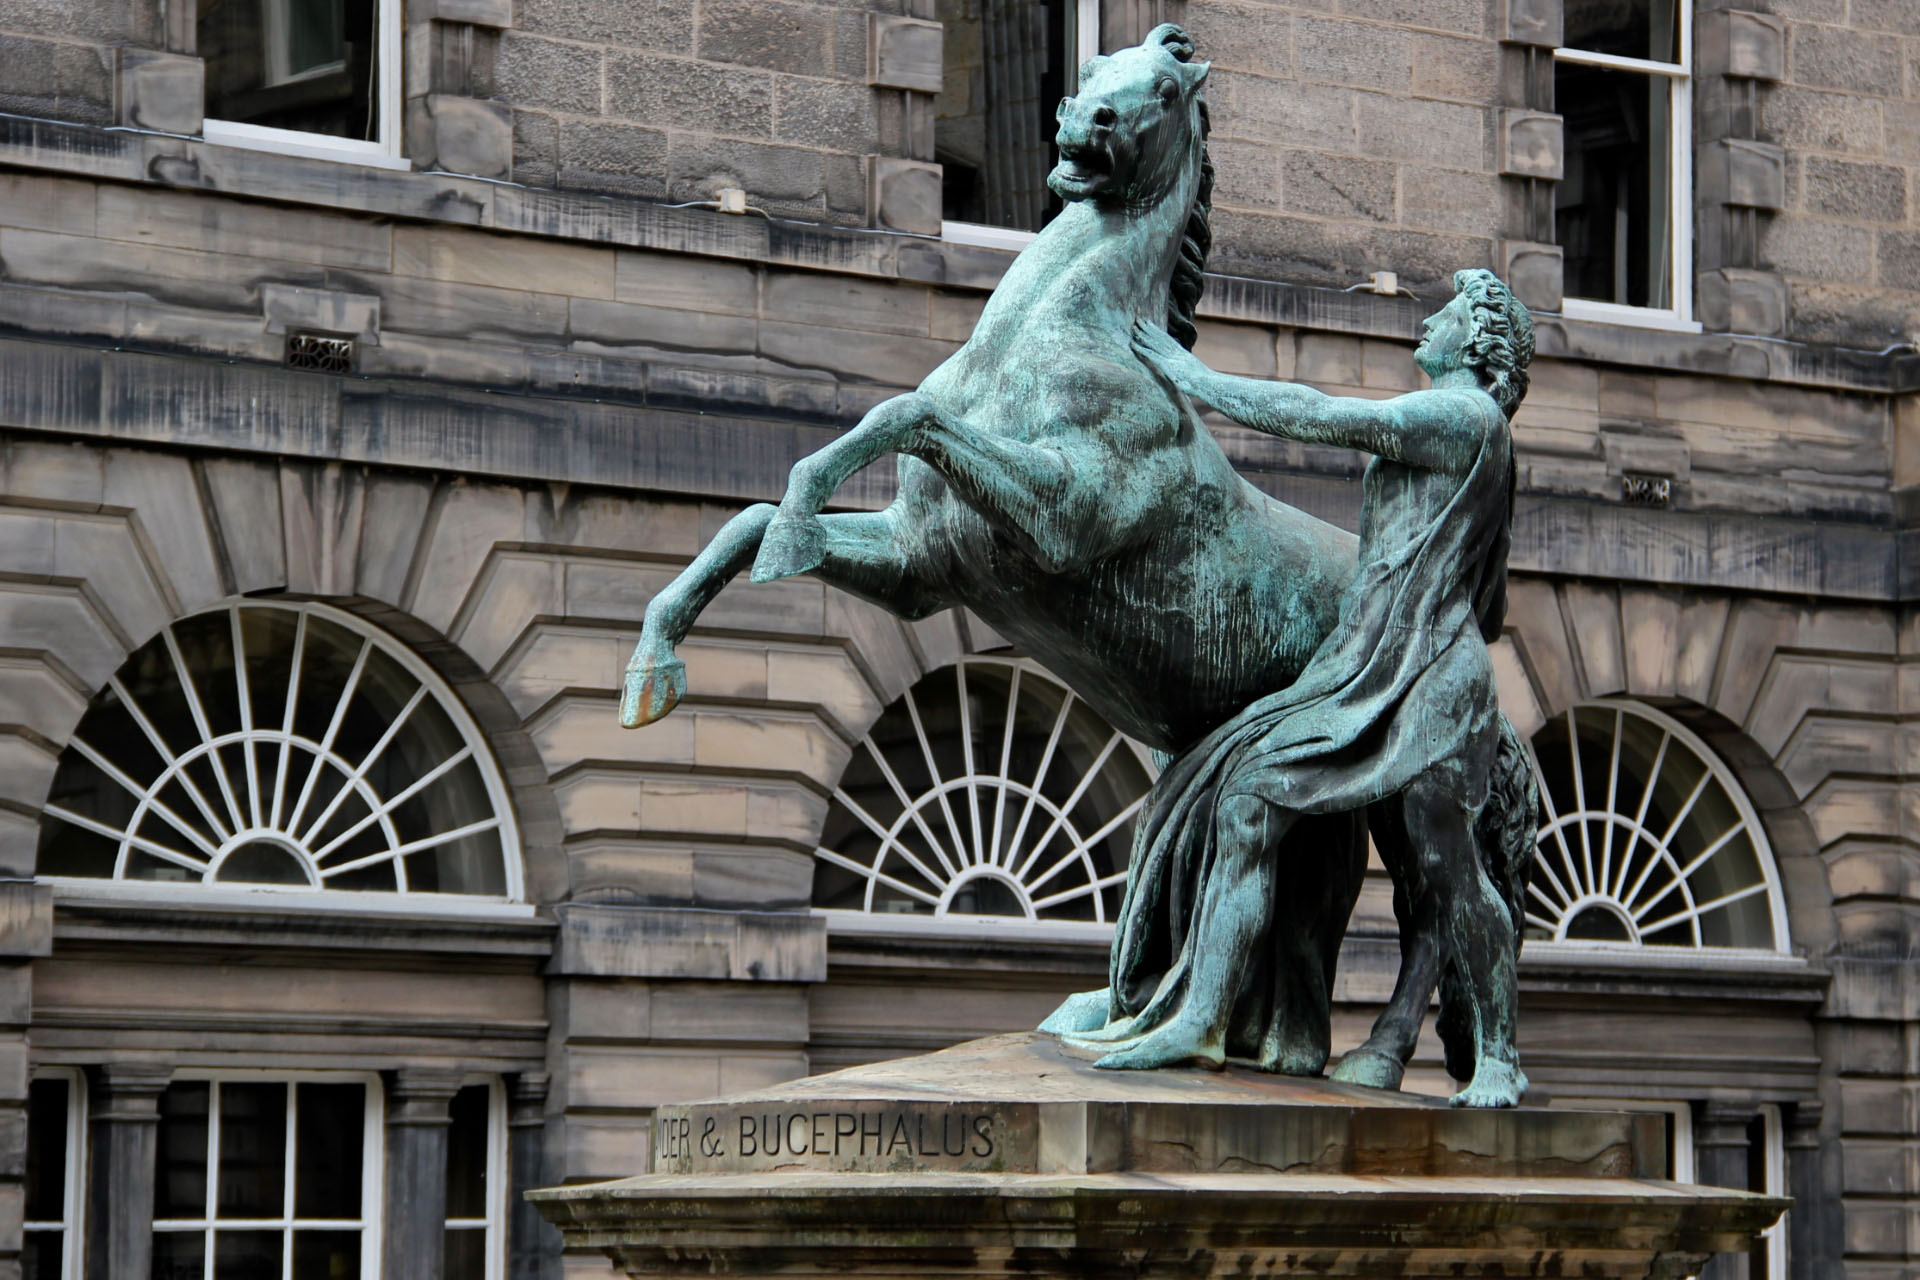 Bucephalus, Alexander's Horse